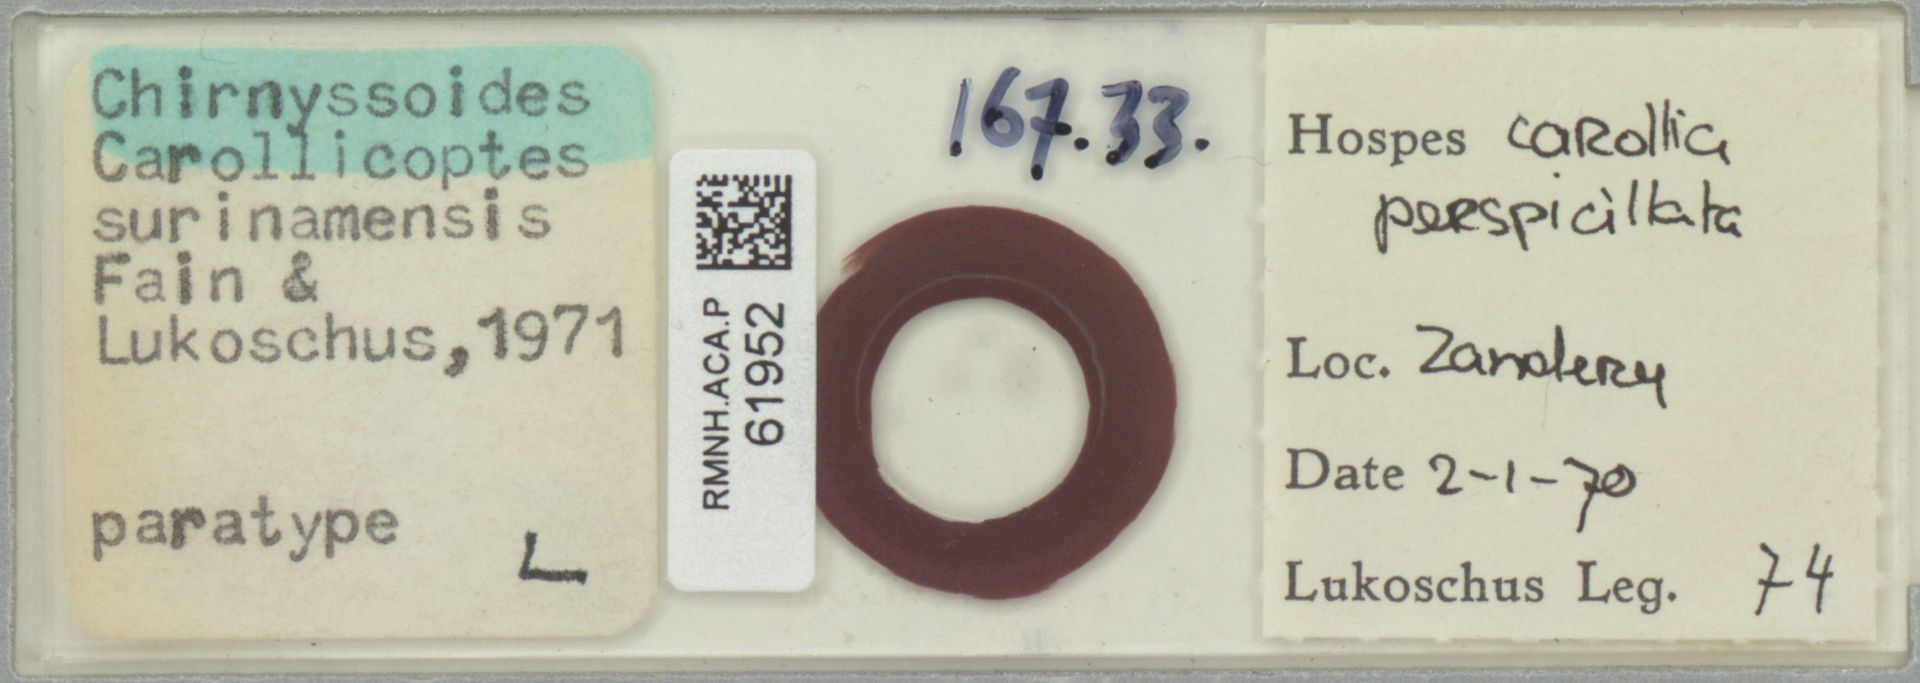 RMNH.ACA.P.61952 | Chirnyssoides (Carrolicoptes) surinamensis Fain & Lukoschus 1971